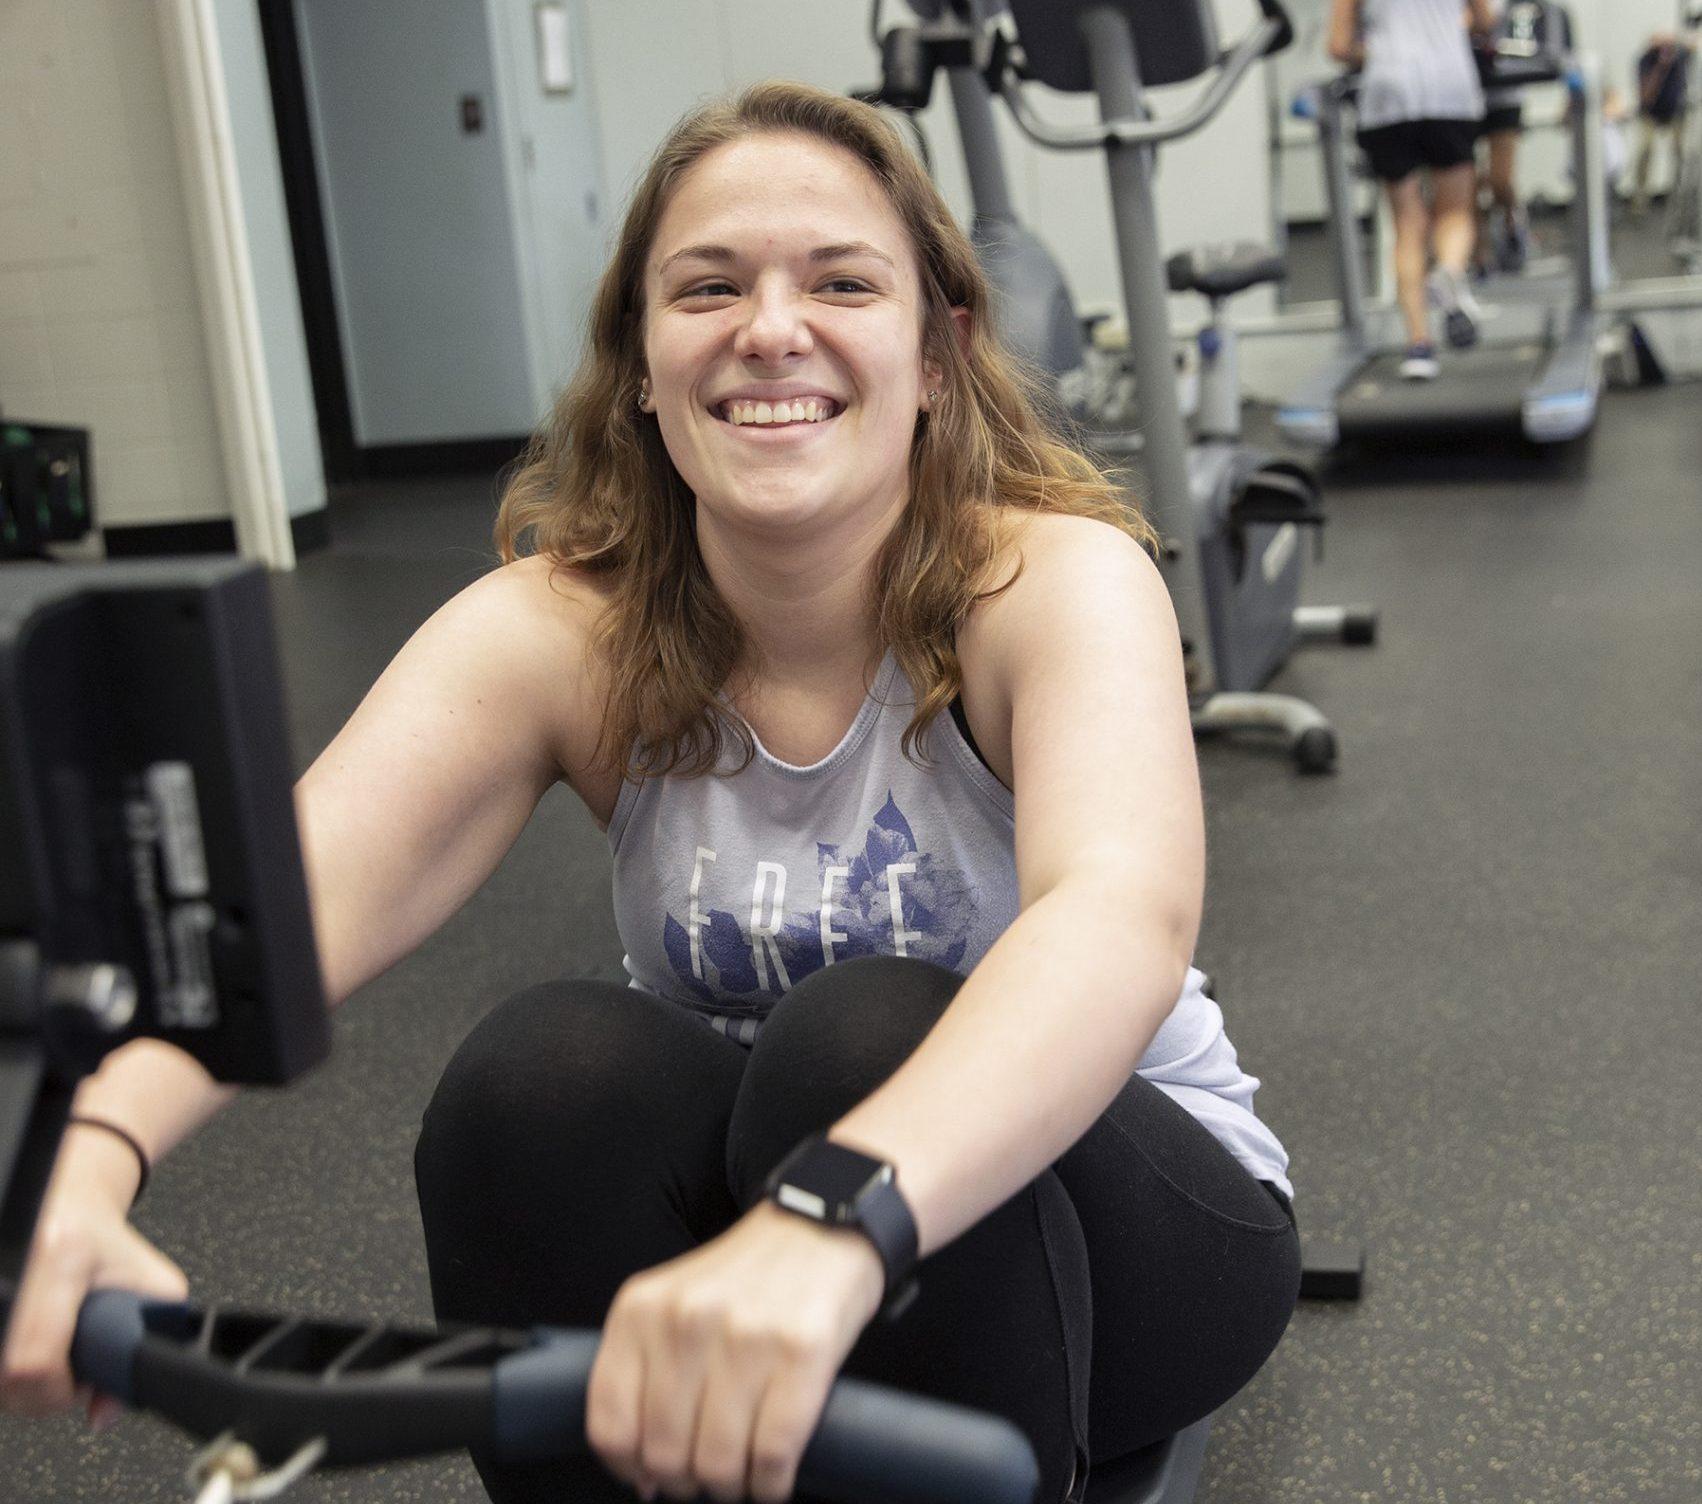 row machine, rowing, cardio, cardio gym, ywca co-ed gym